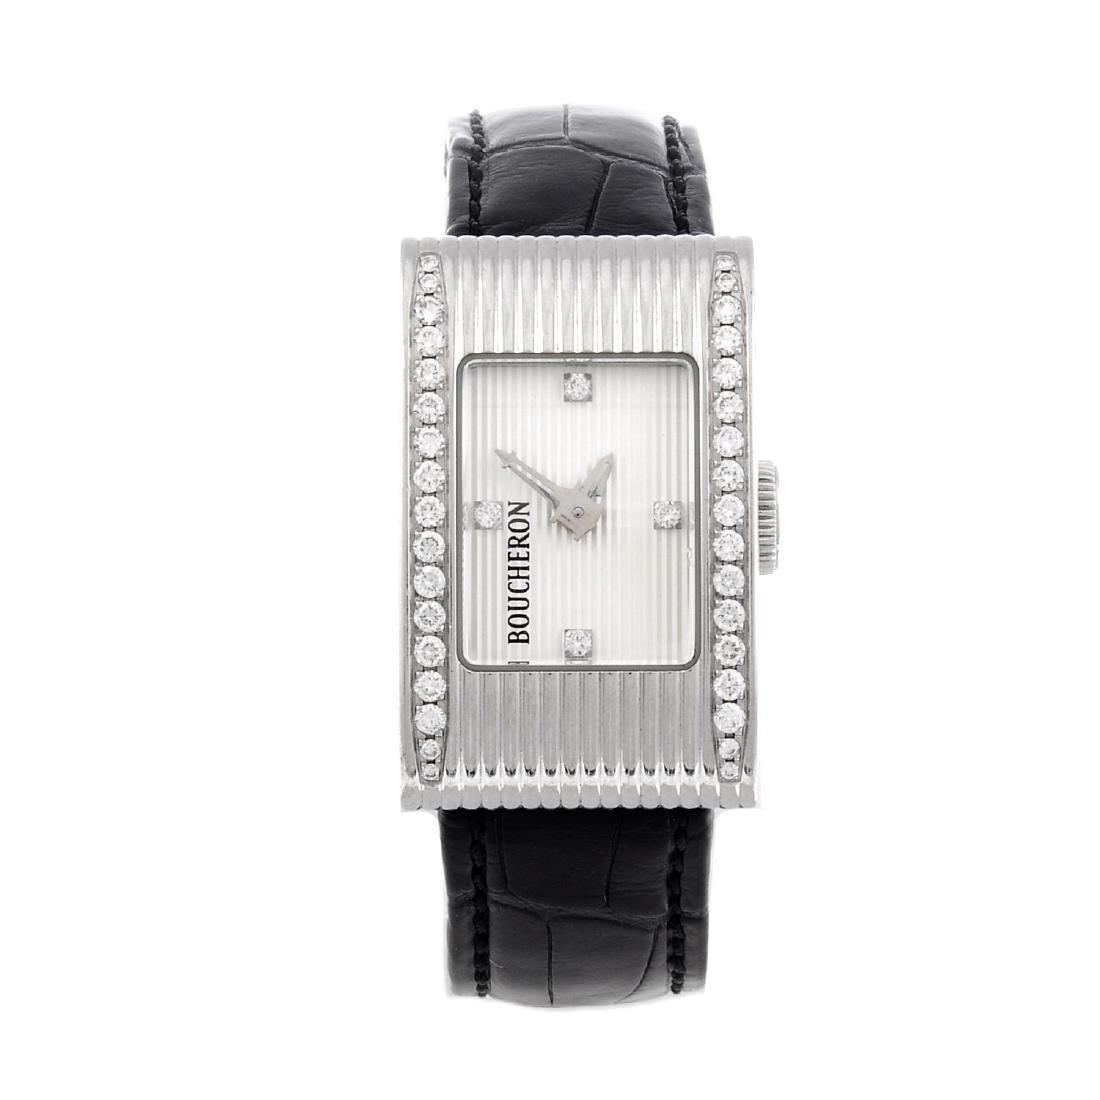 BOUCHERON - a lady's wrist watch. Stainless steel